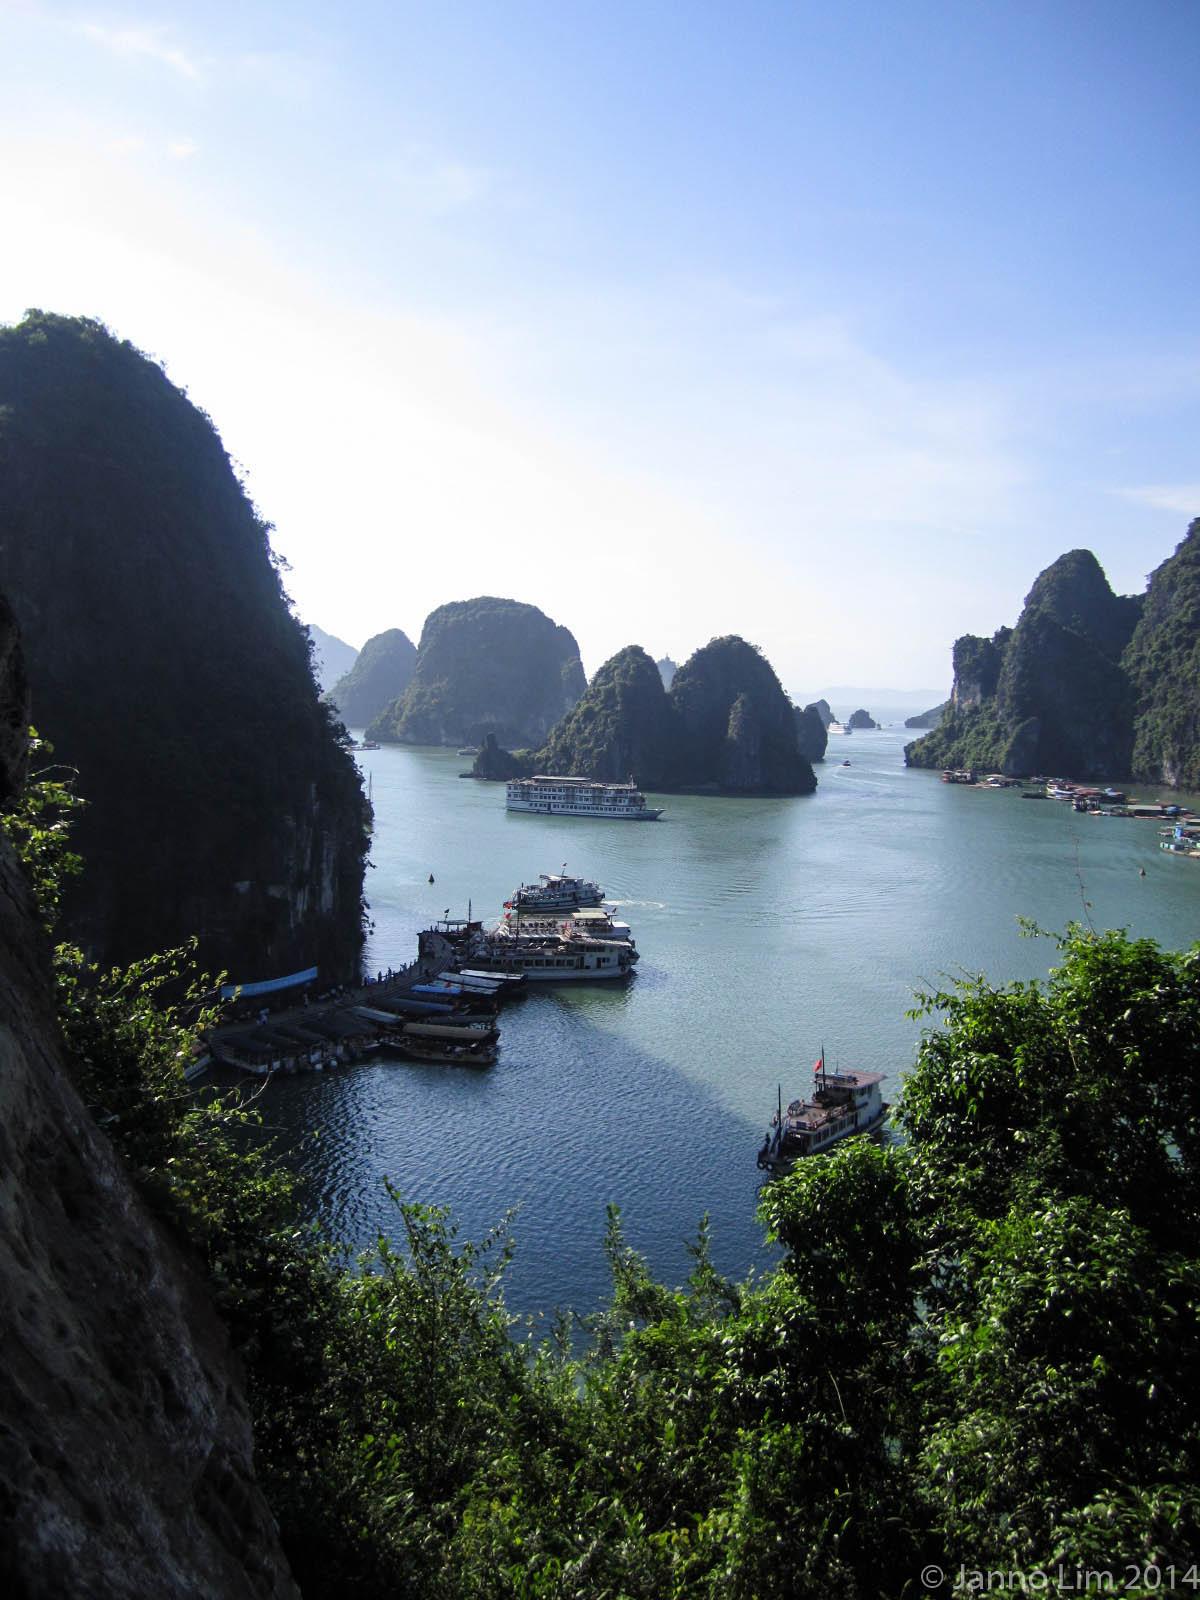 Ha Long Bay – A Poetic Landscape